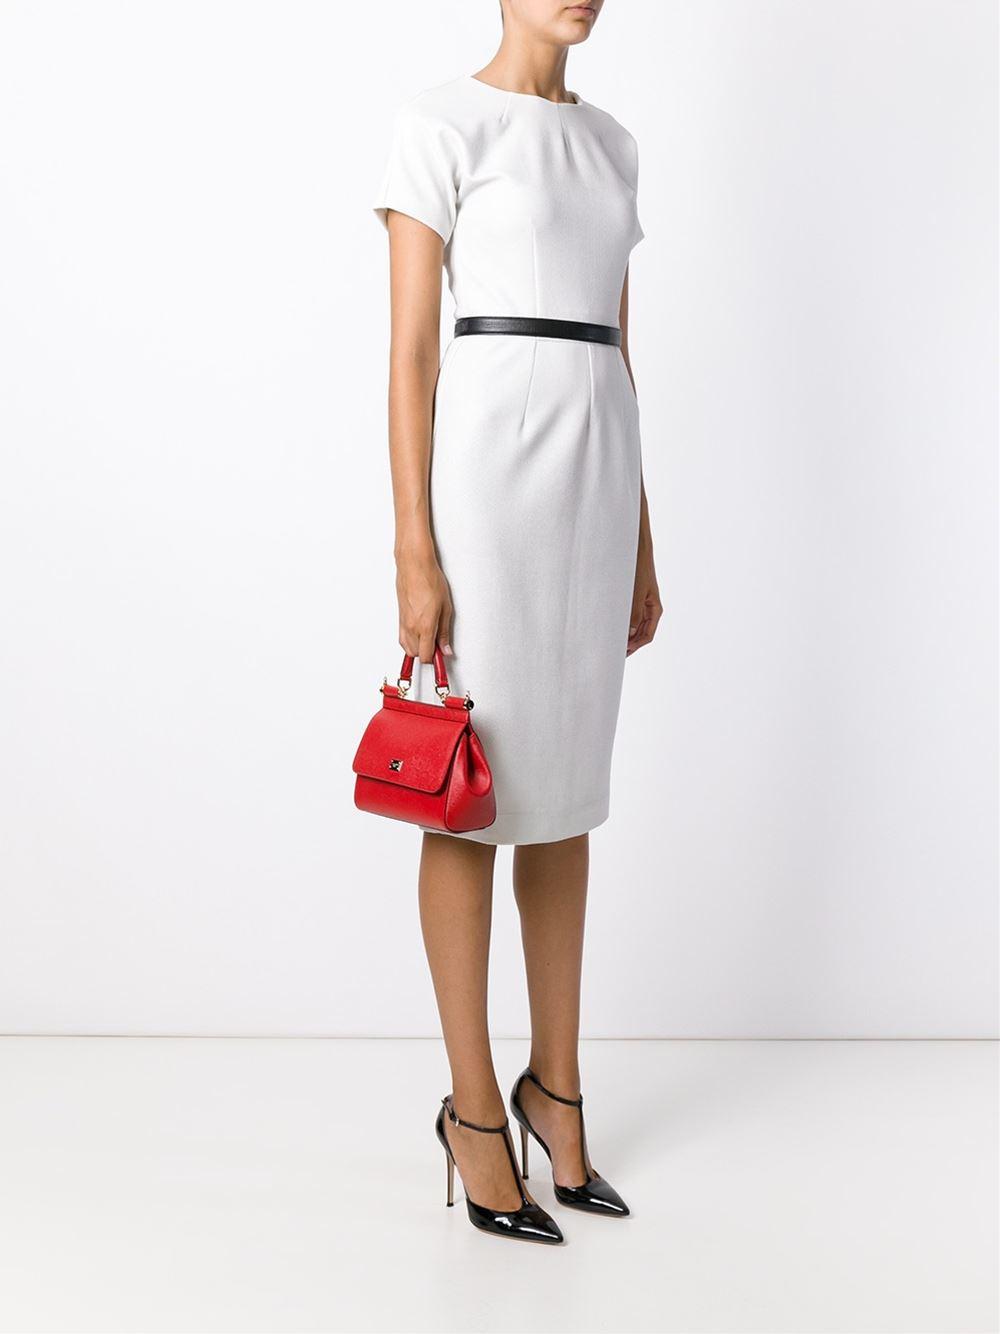 ee005ed0bf2 Dolce & Gabbana Miss Sicily Small Handbag in Red - Lyst